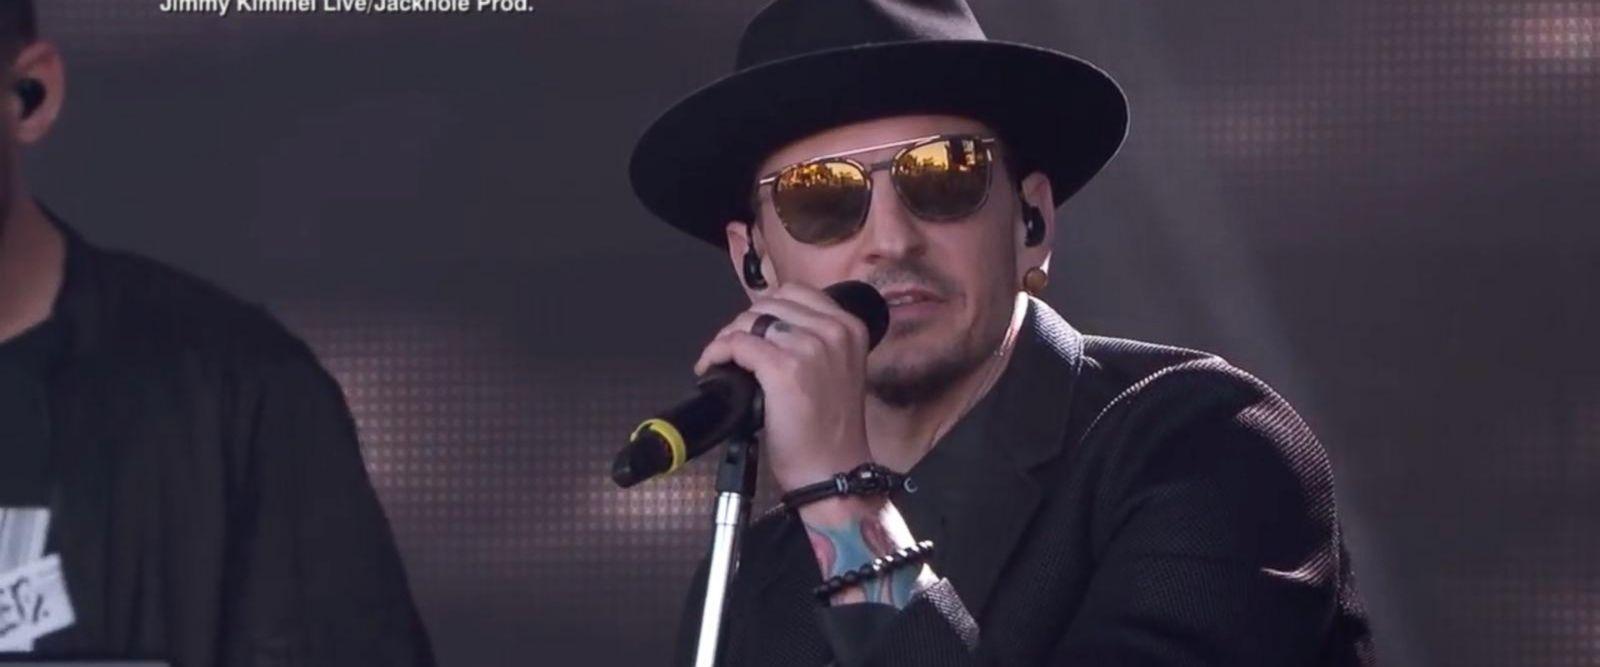 VIDEO: Linkin Park lead singer dead at 41